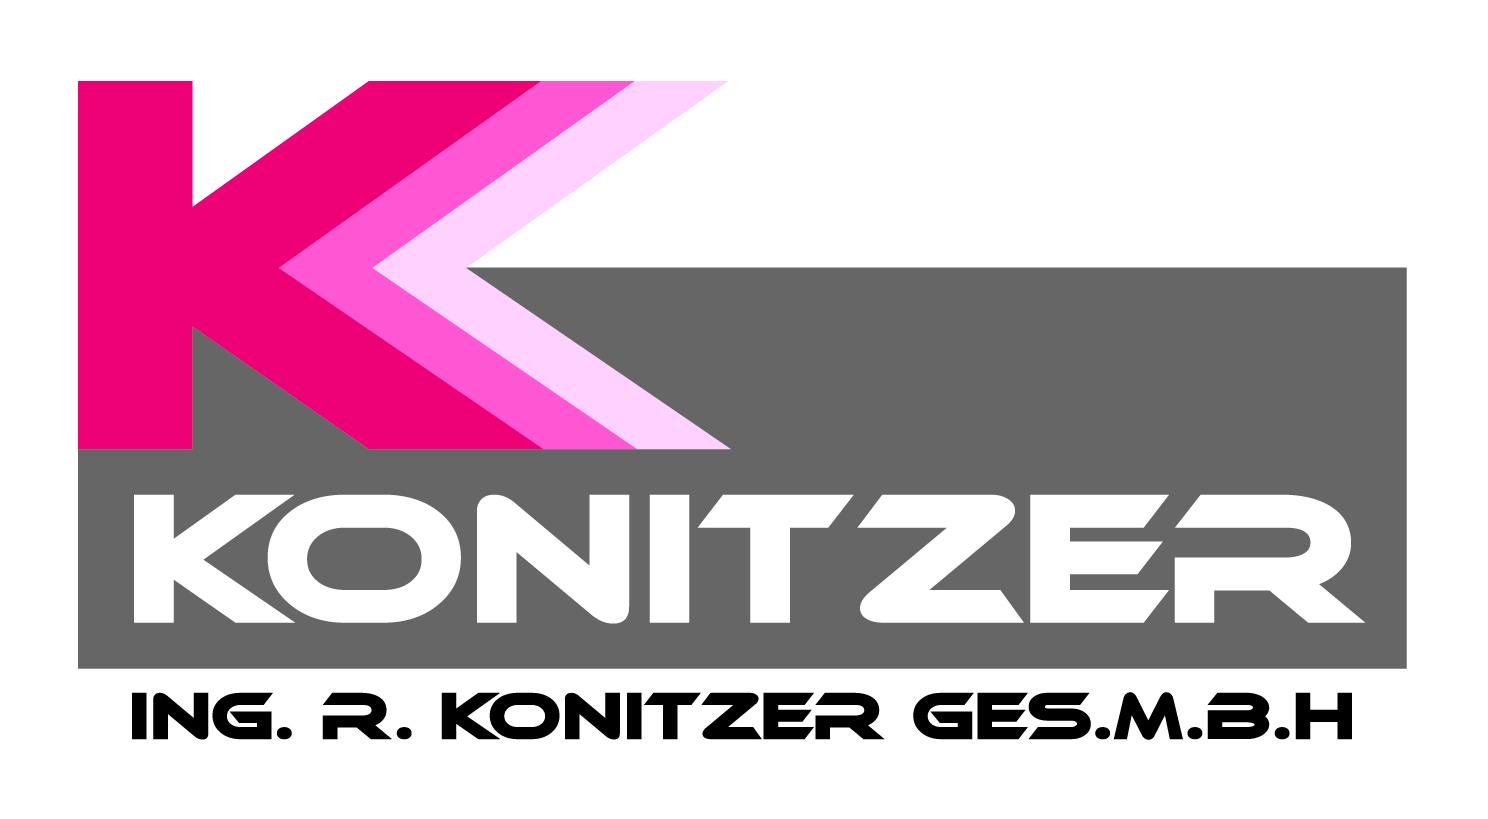 Konitzer